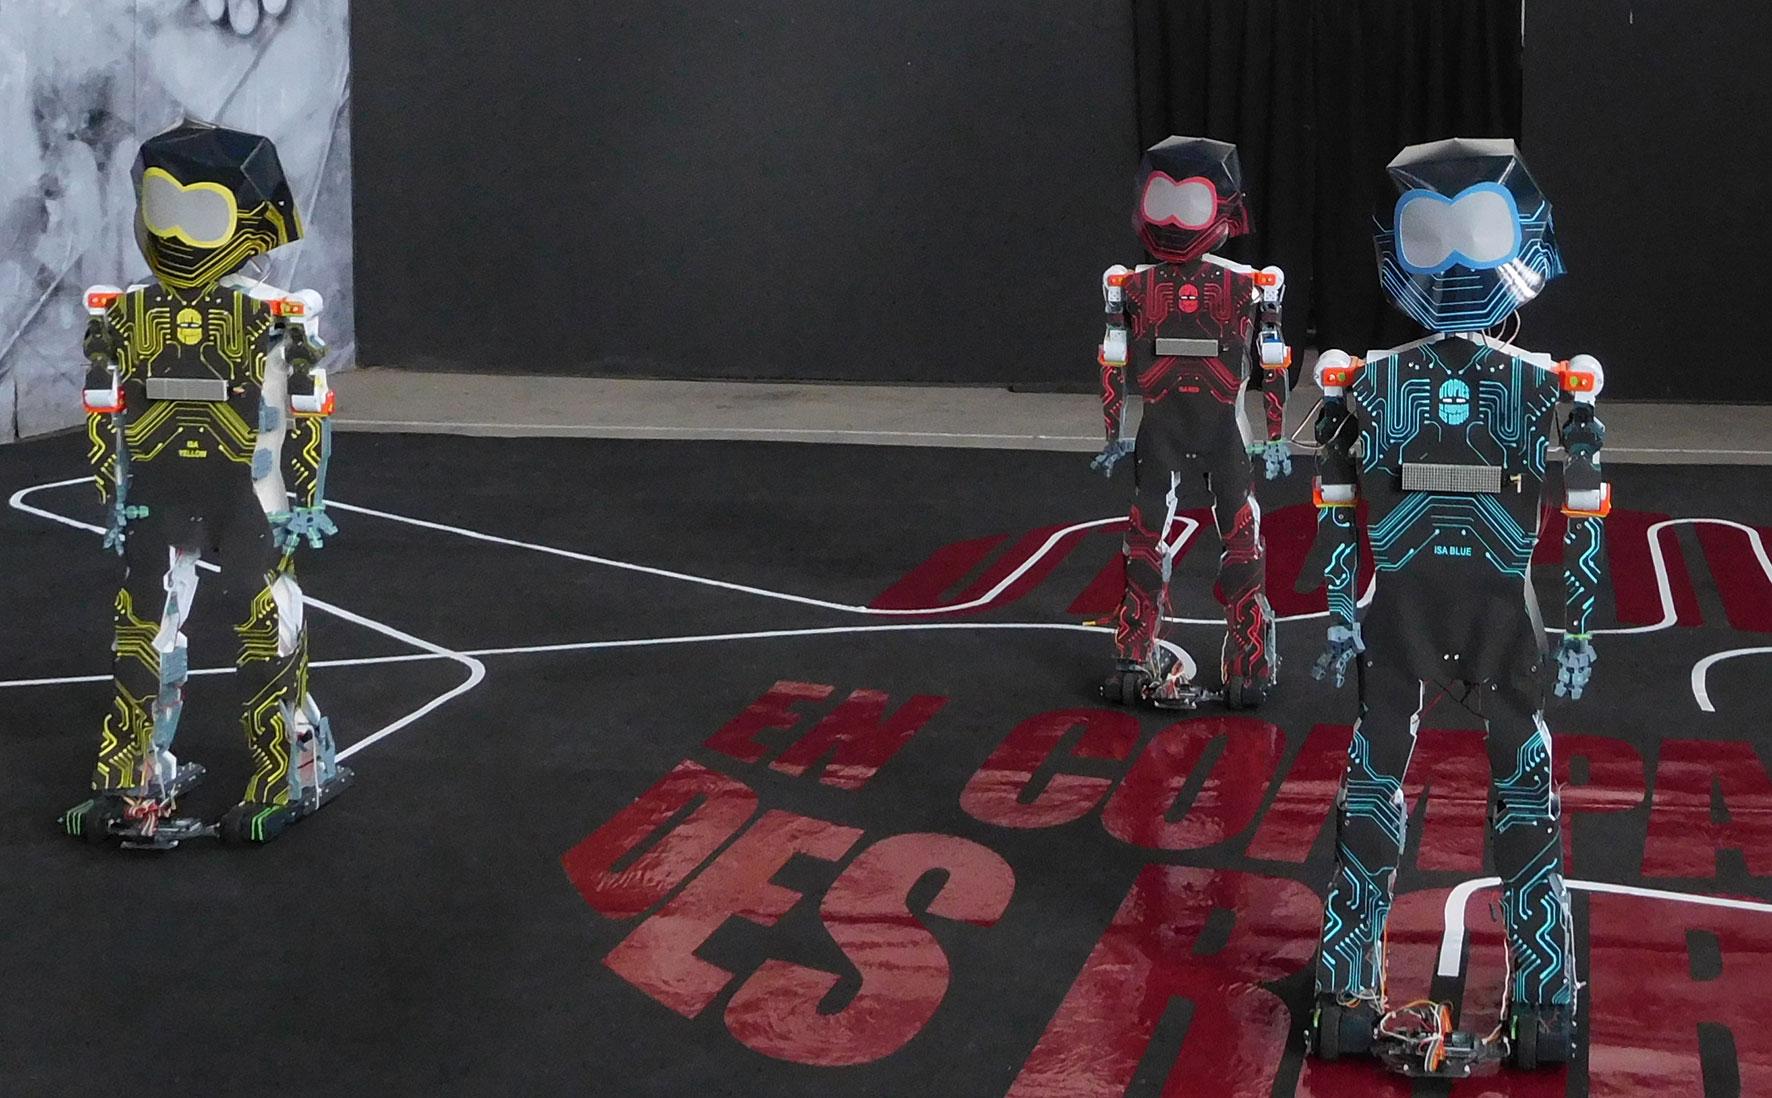 Utopies-en-compagnie-des-robots-ballet-c.